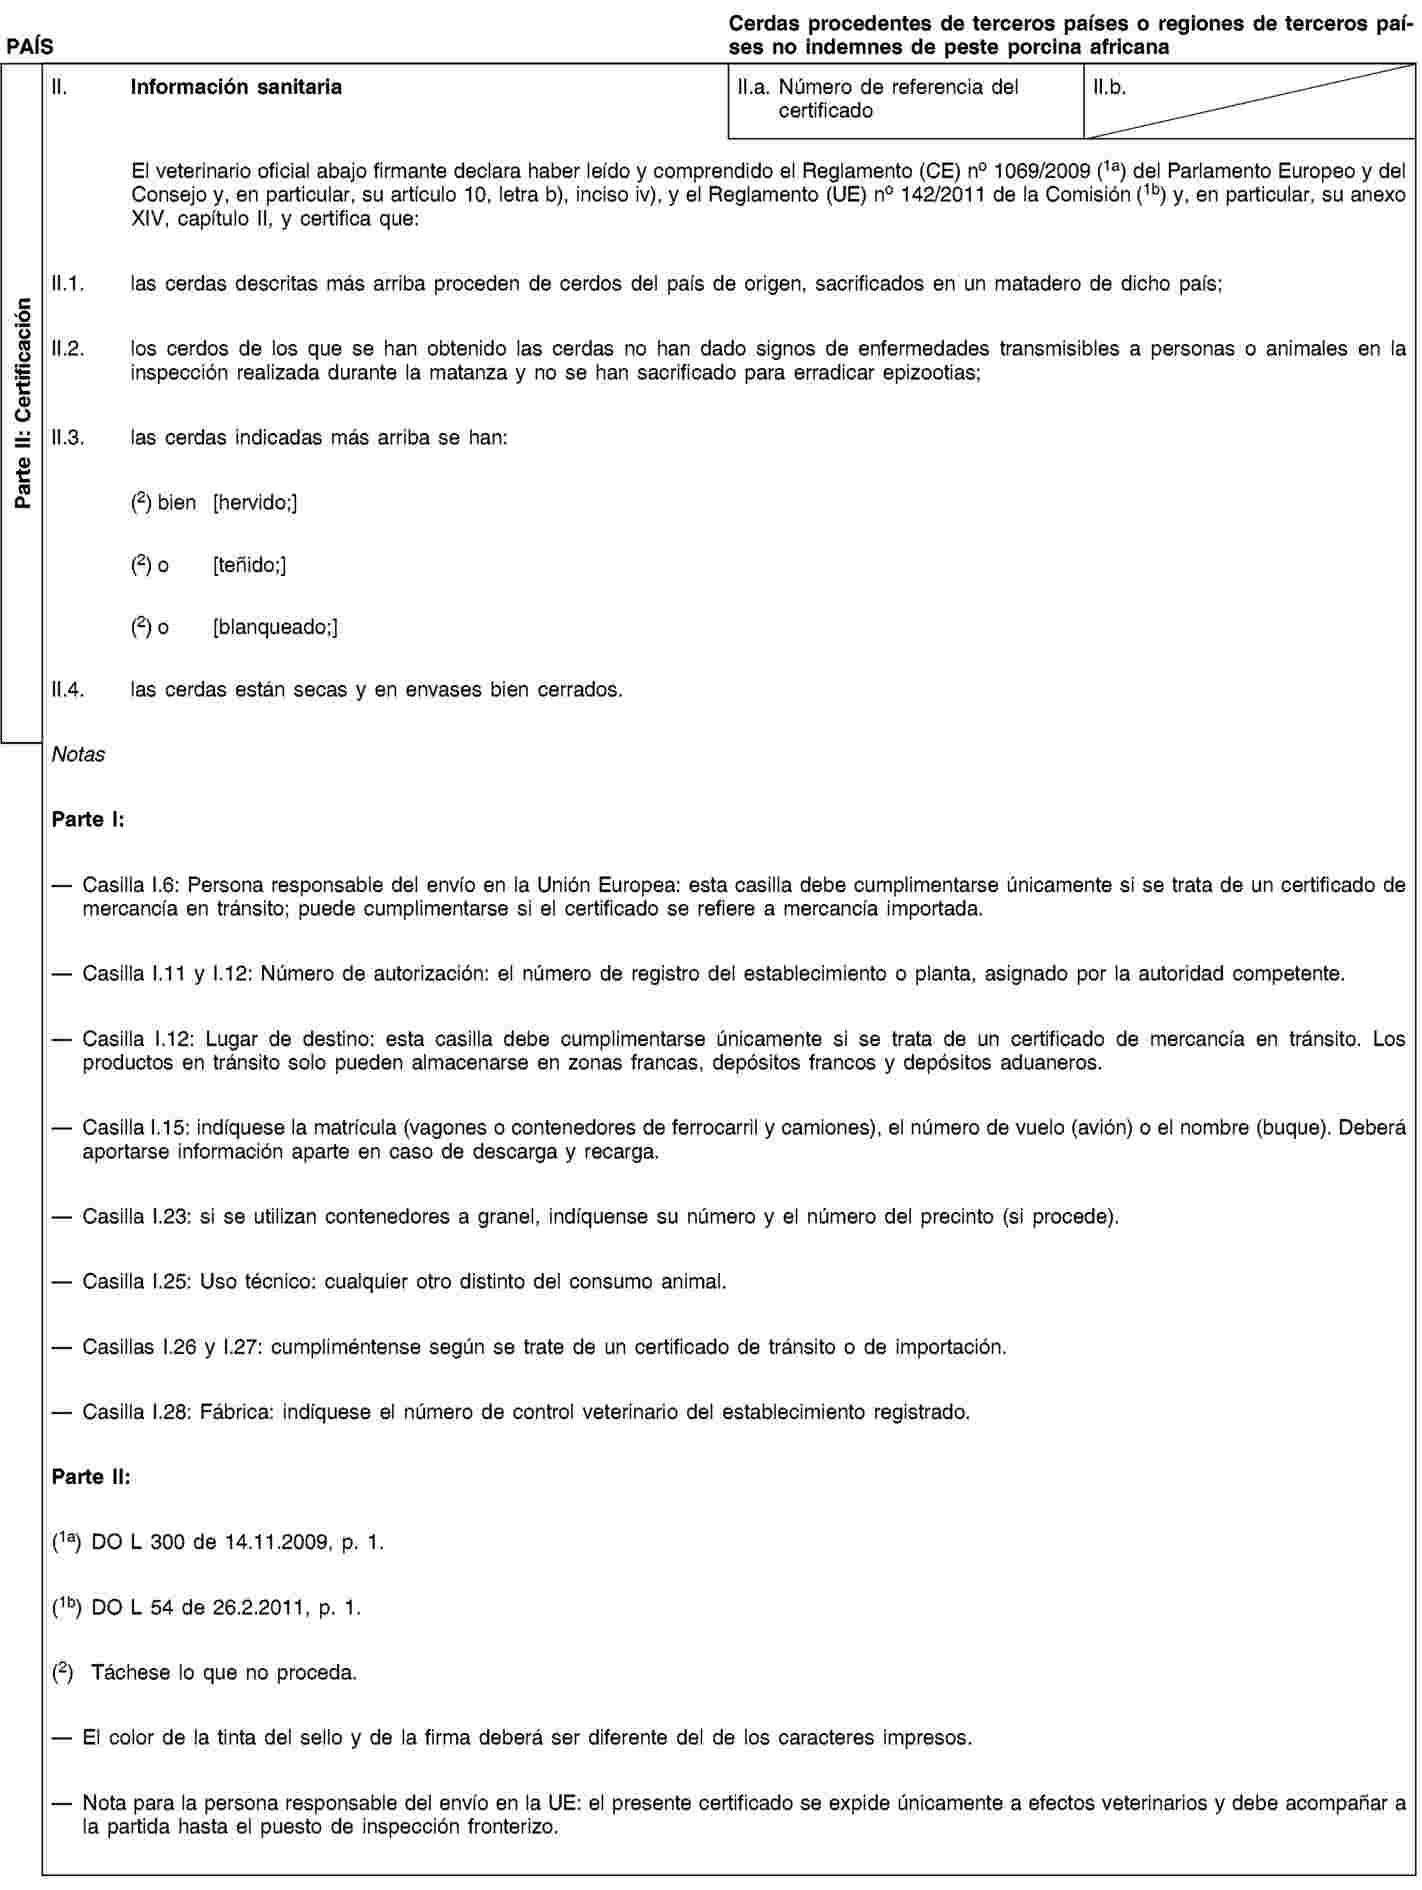 Imagen: https://eur-lex.europa.eu/resource.html?uri=uriserv:OJ.L_.2011.054.01.0001.01.SPA.xhtml.L_2011054ES.01019401.tif.jpg